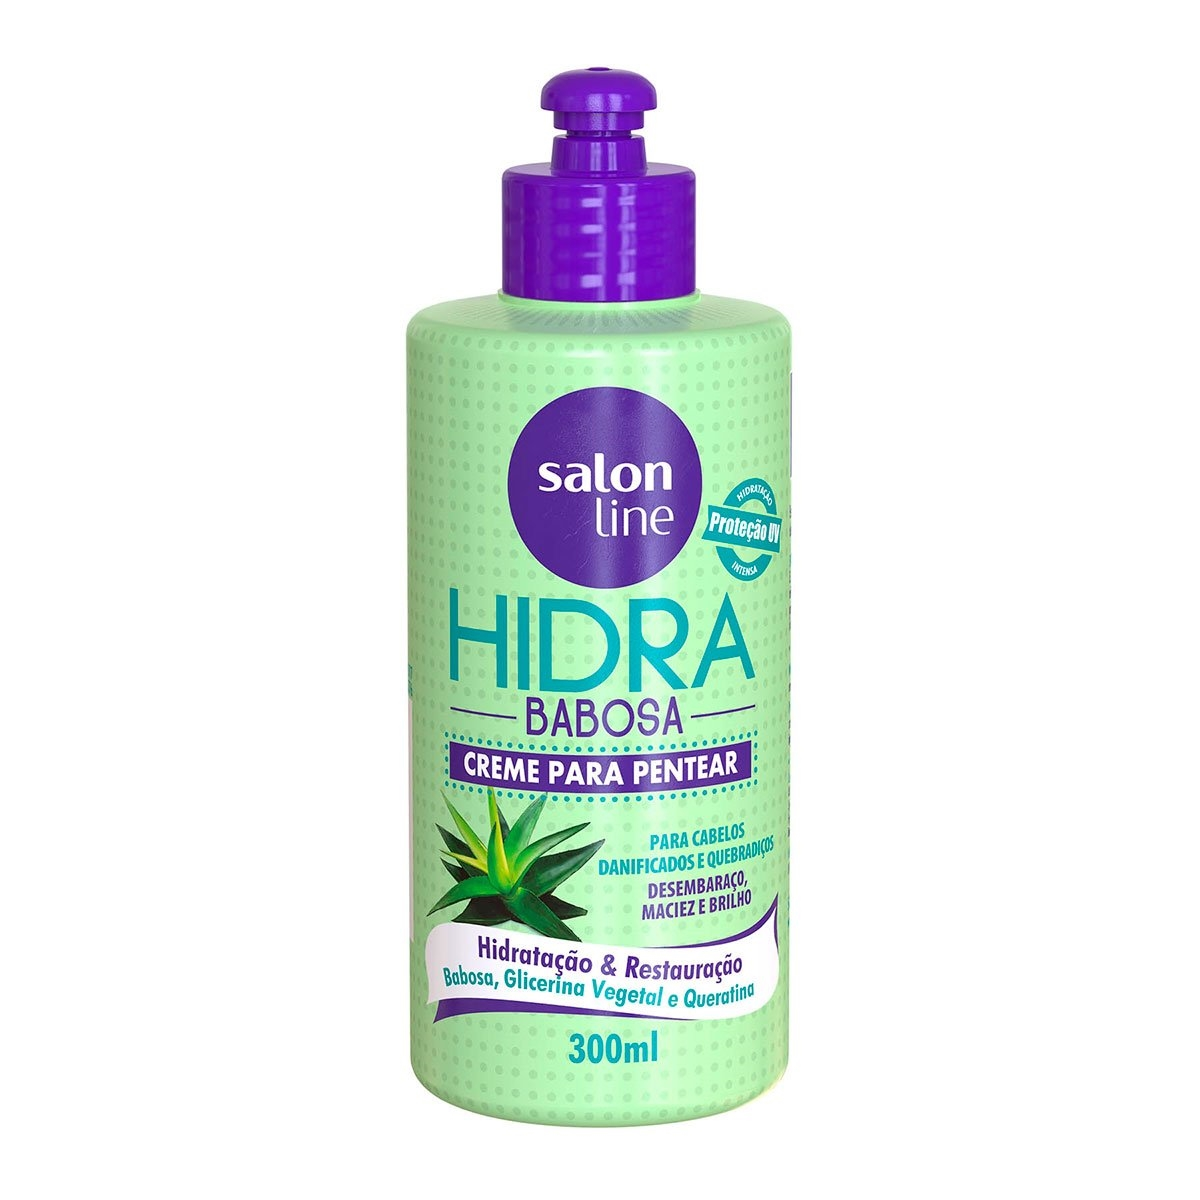 SALON LINE HIDRA BABOSA CREME PARA PENTEAR - 300 ml